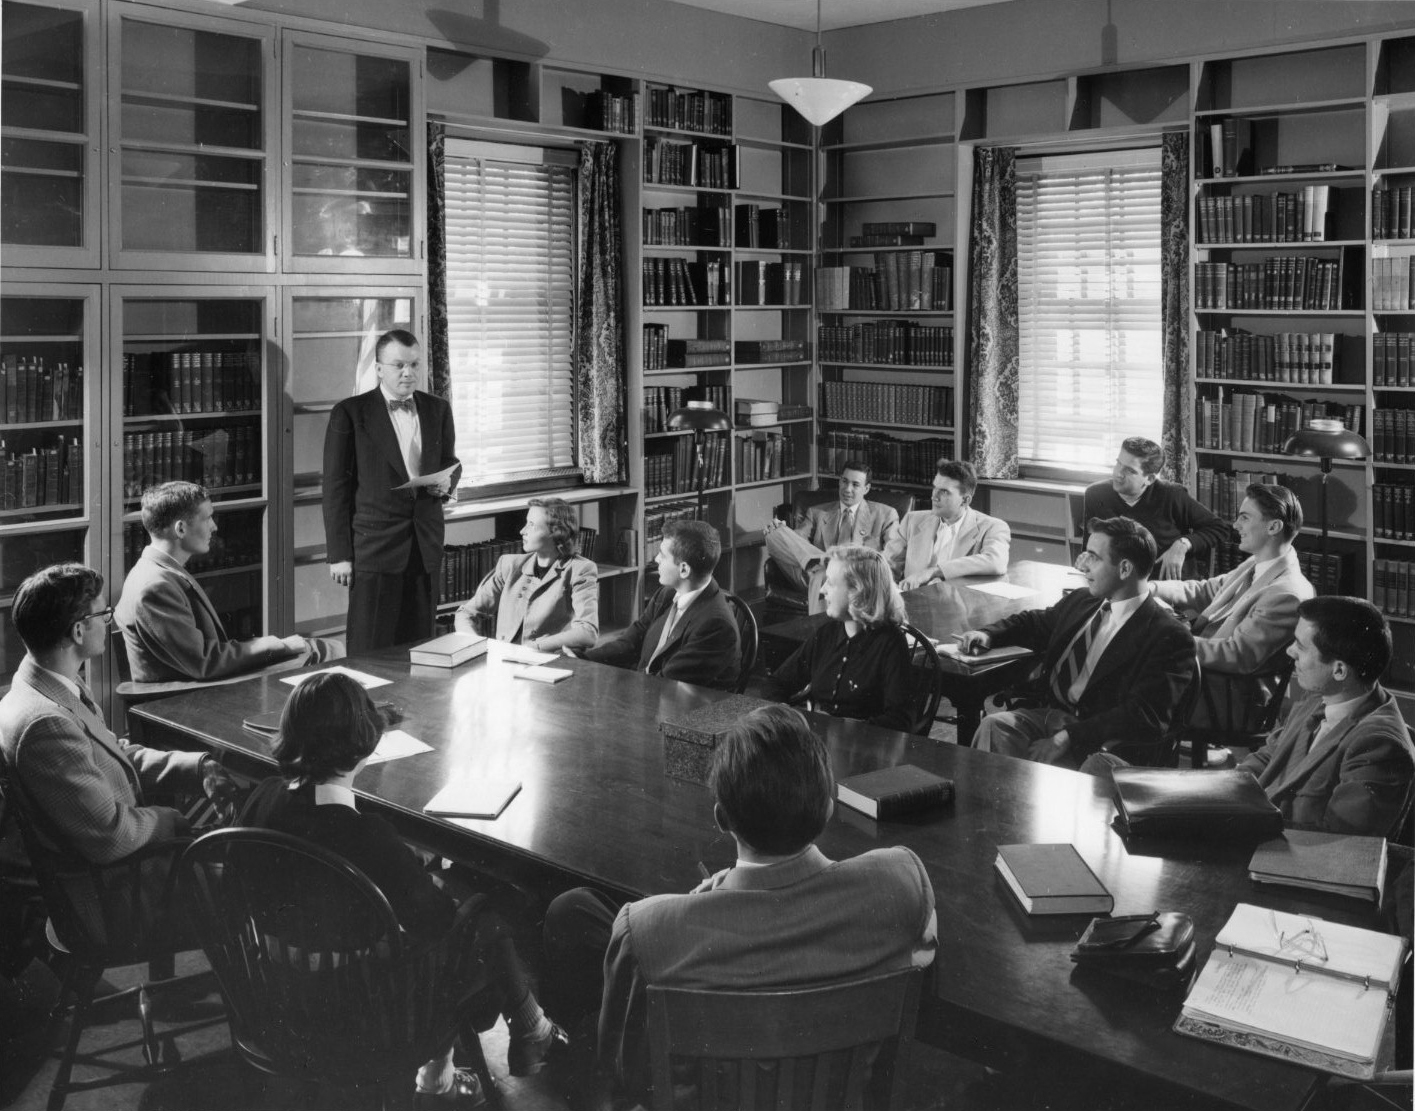 History class, 1952